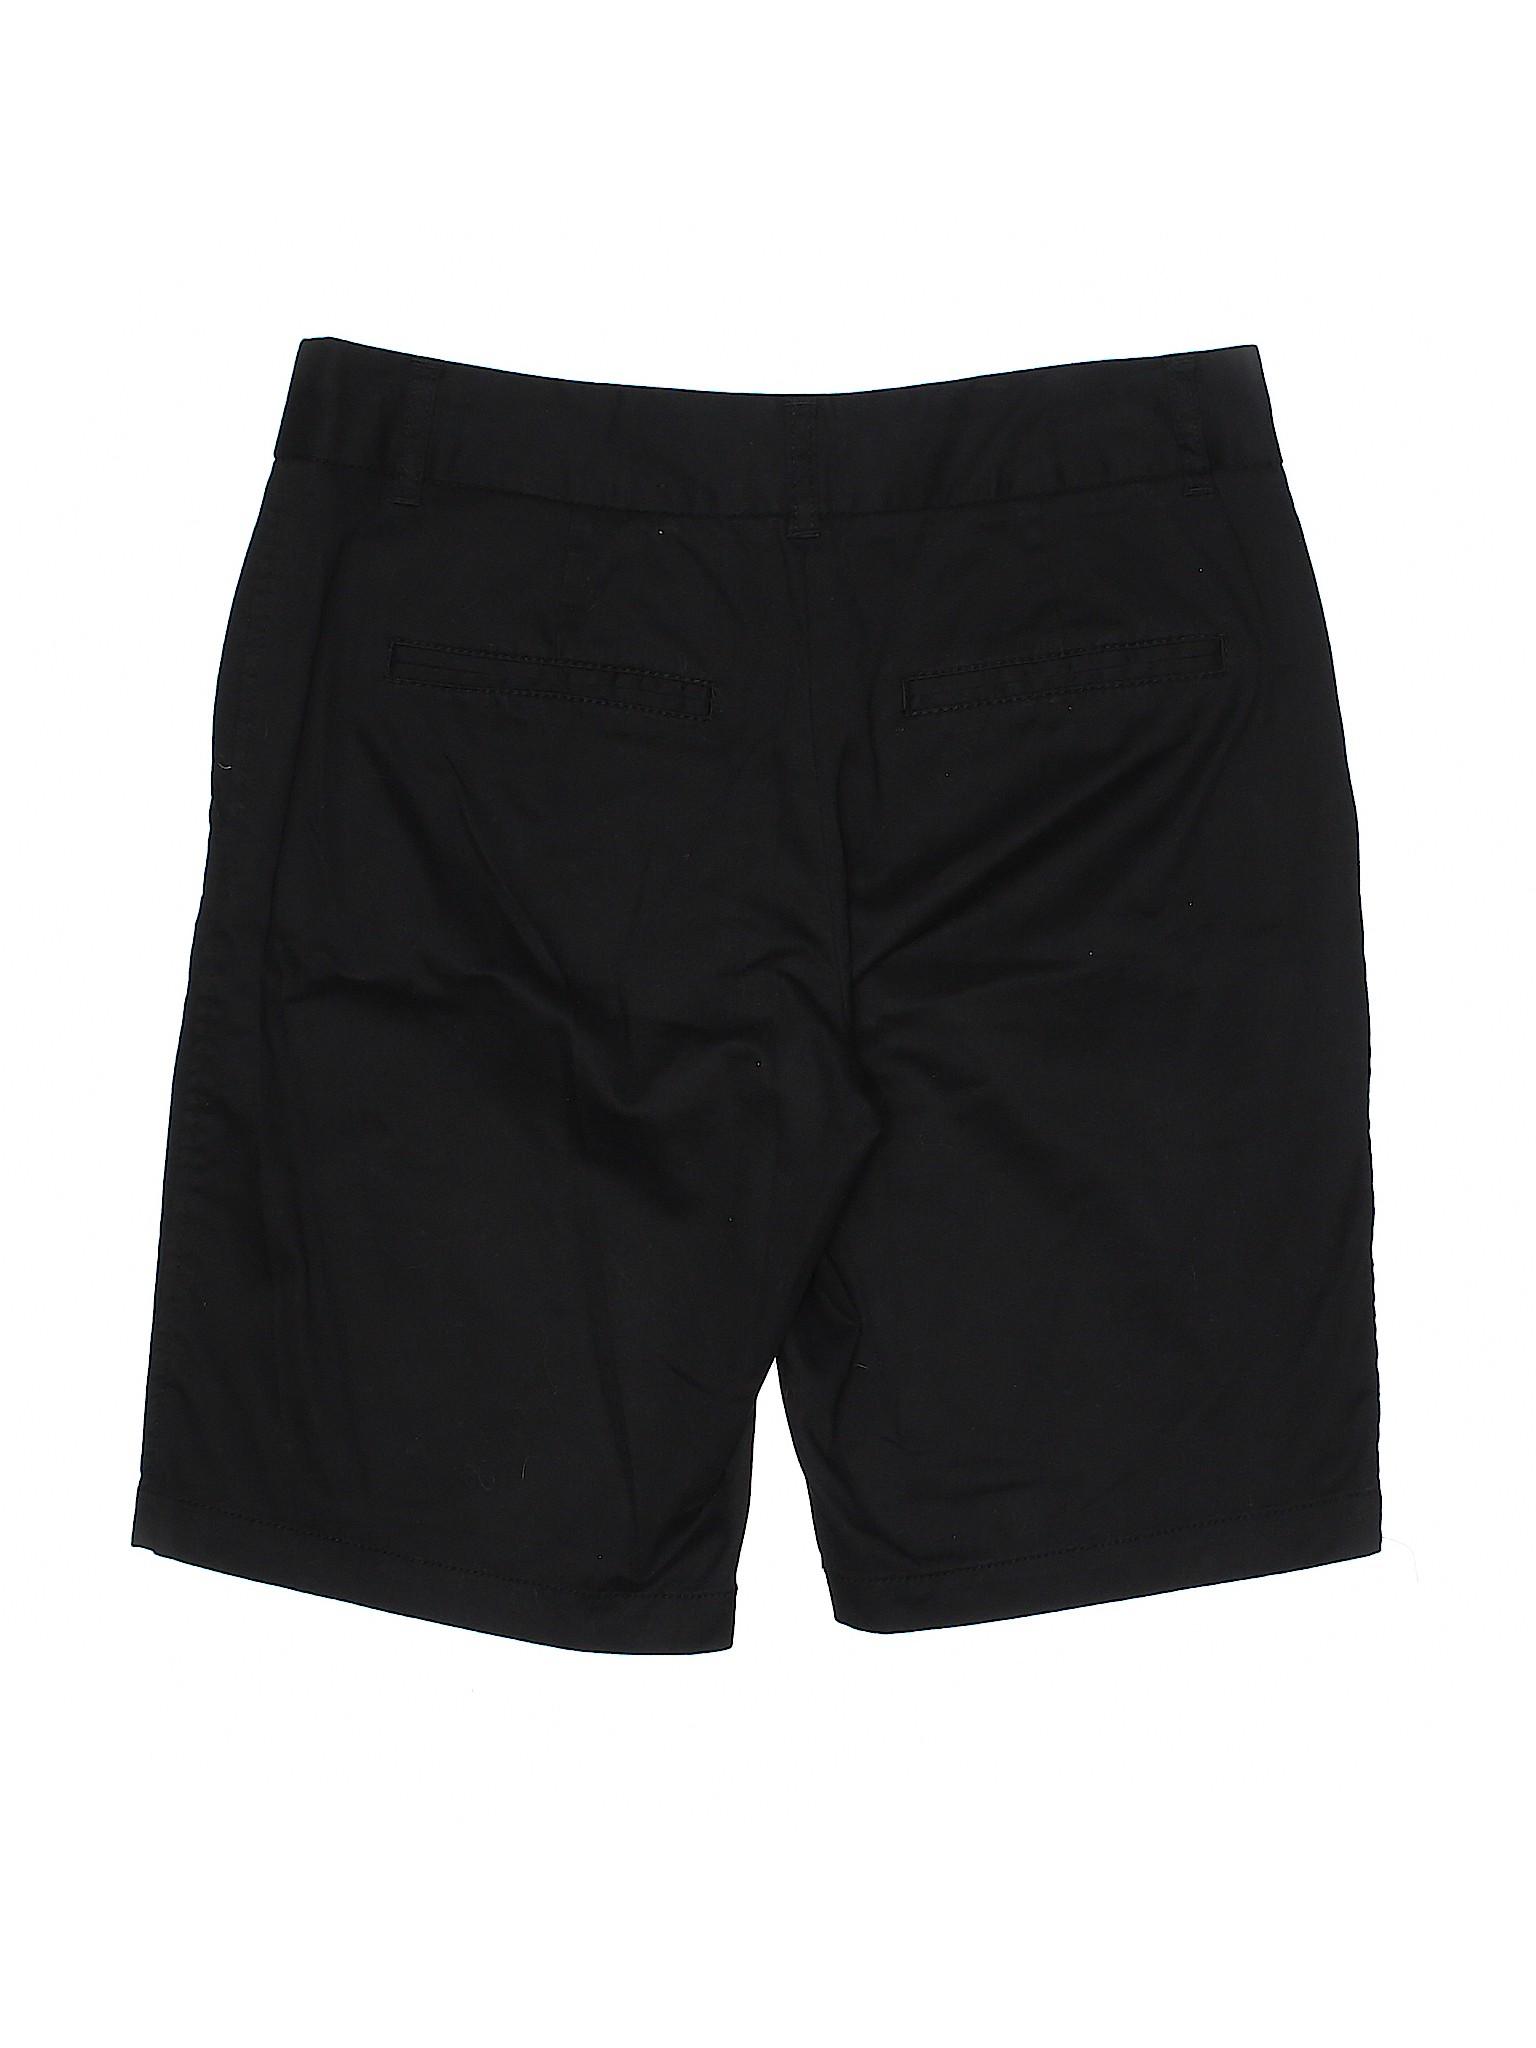 Boutique amp; Ali Roz Khaki Shorts rRrCa